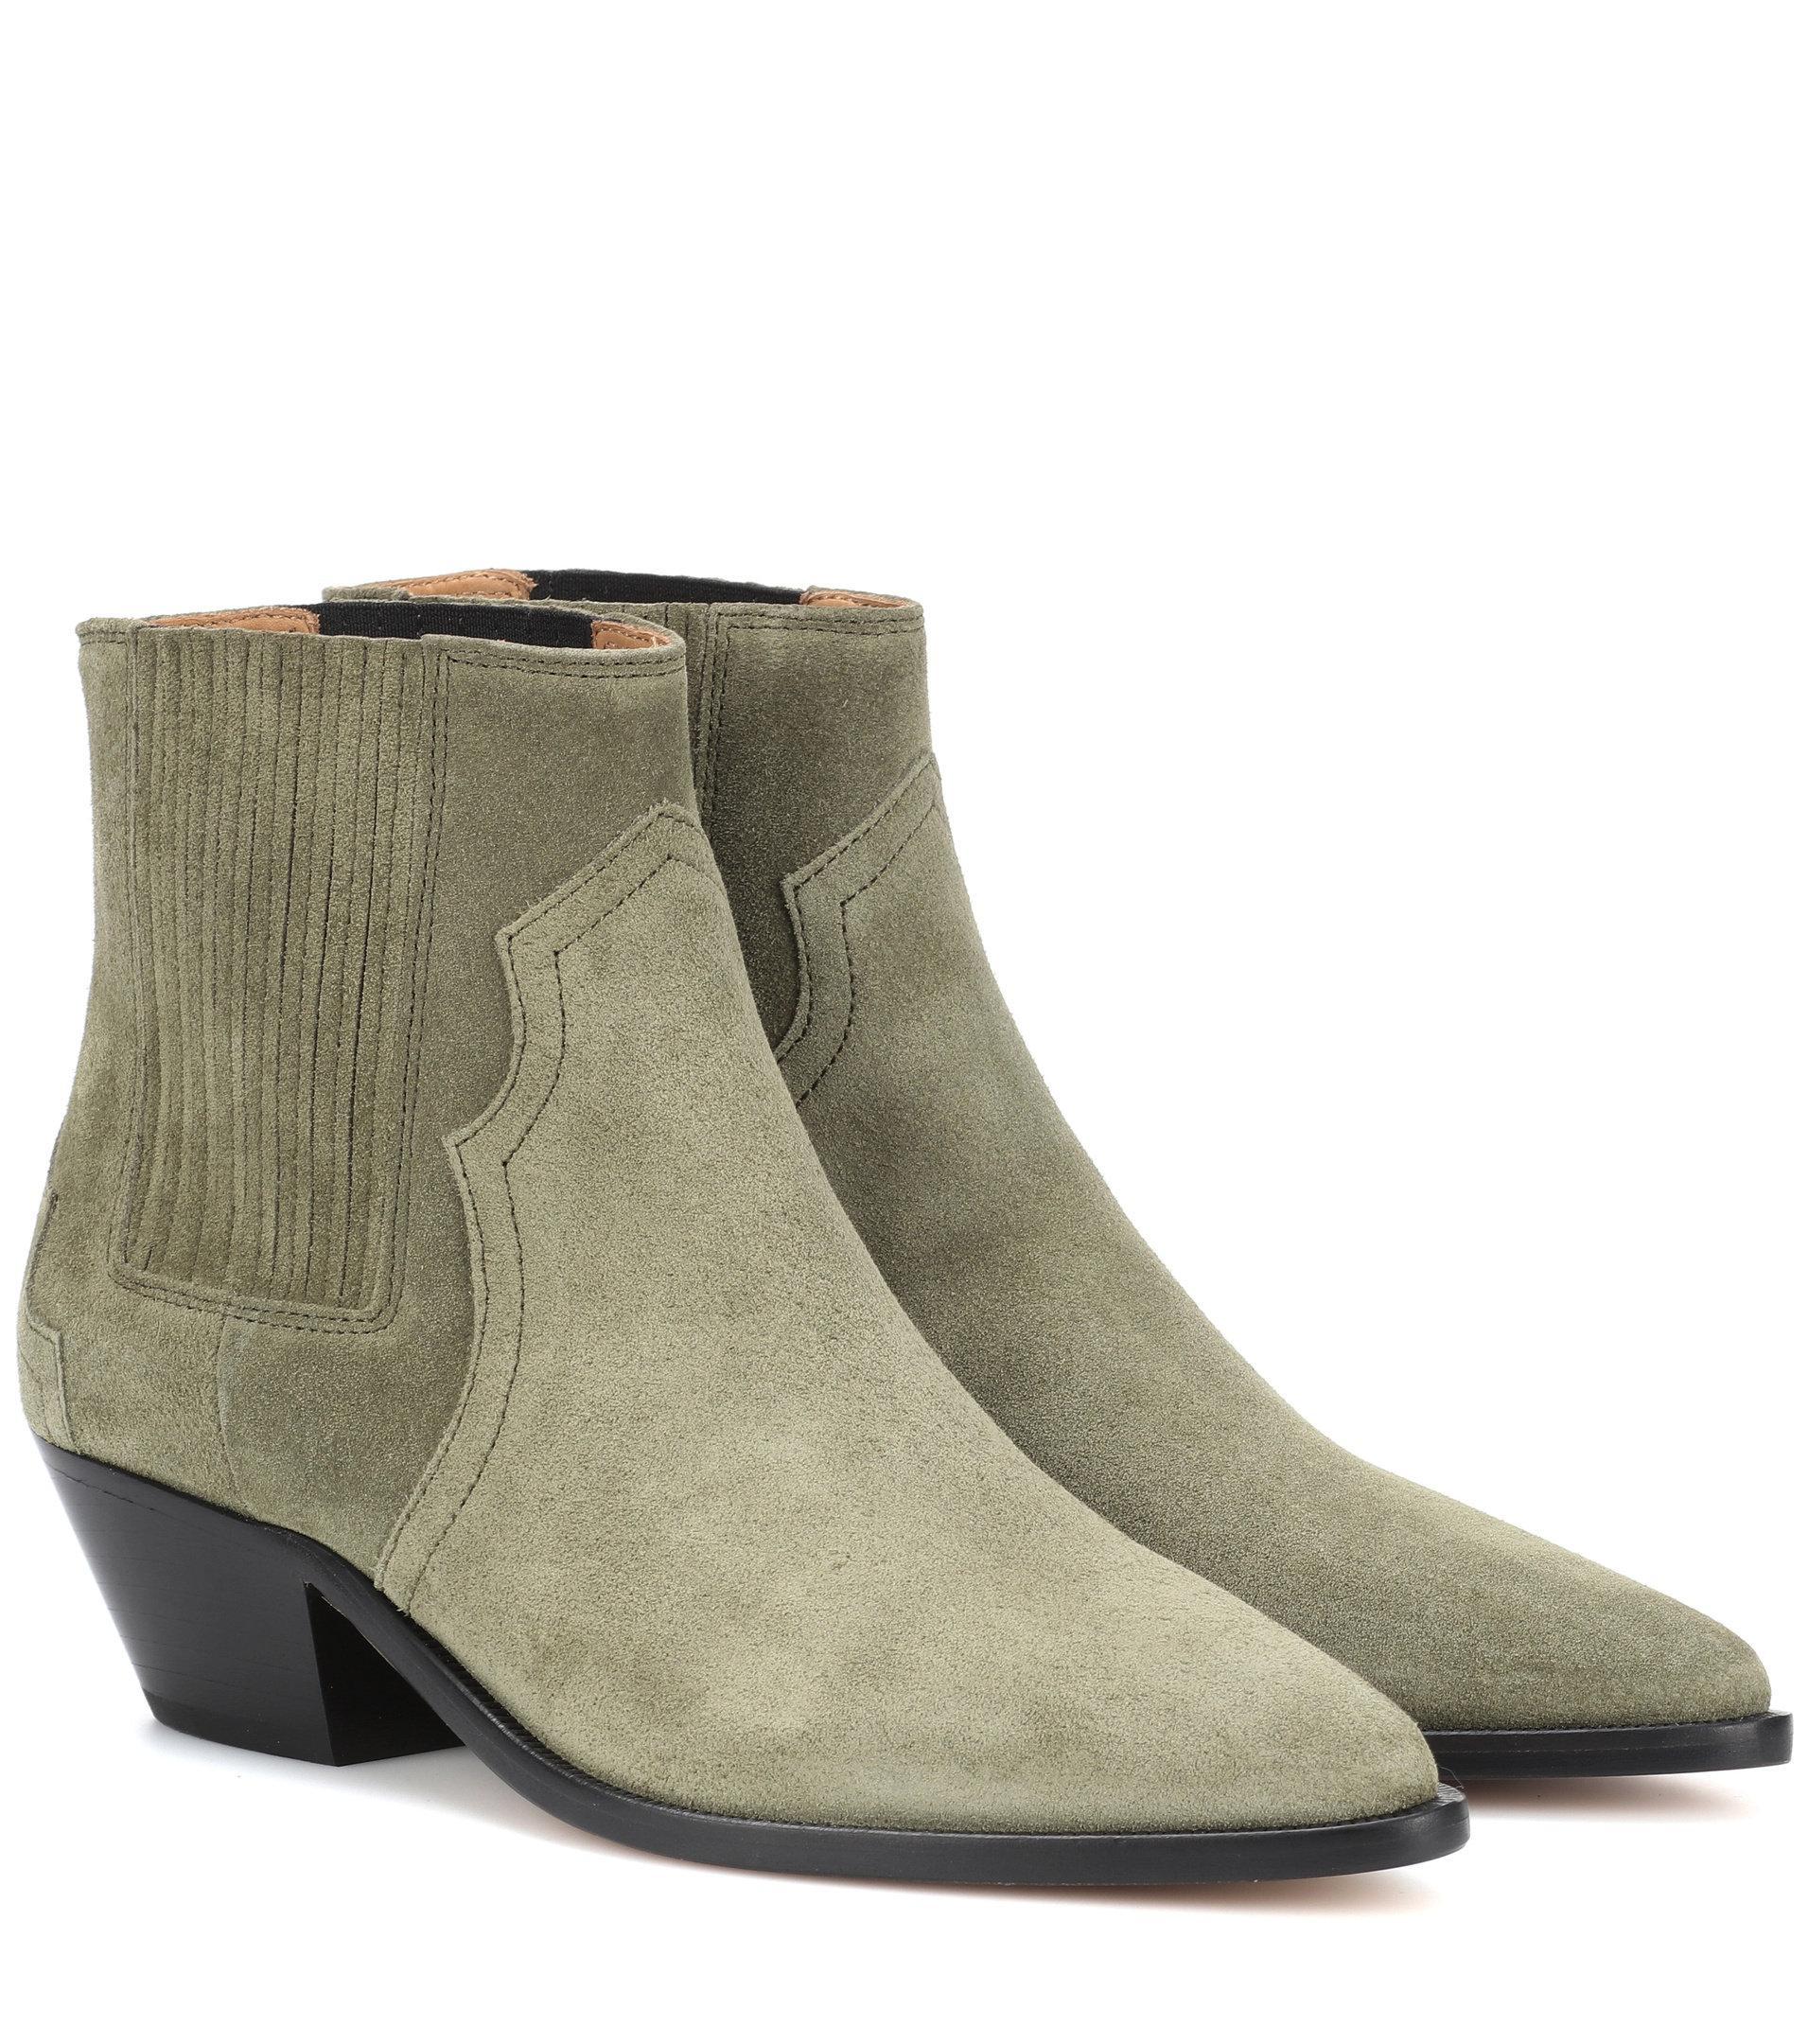 Isabel Marant Beige Derlyn Ankle Boots bHCDUBQiD